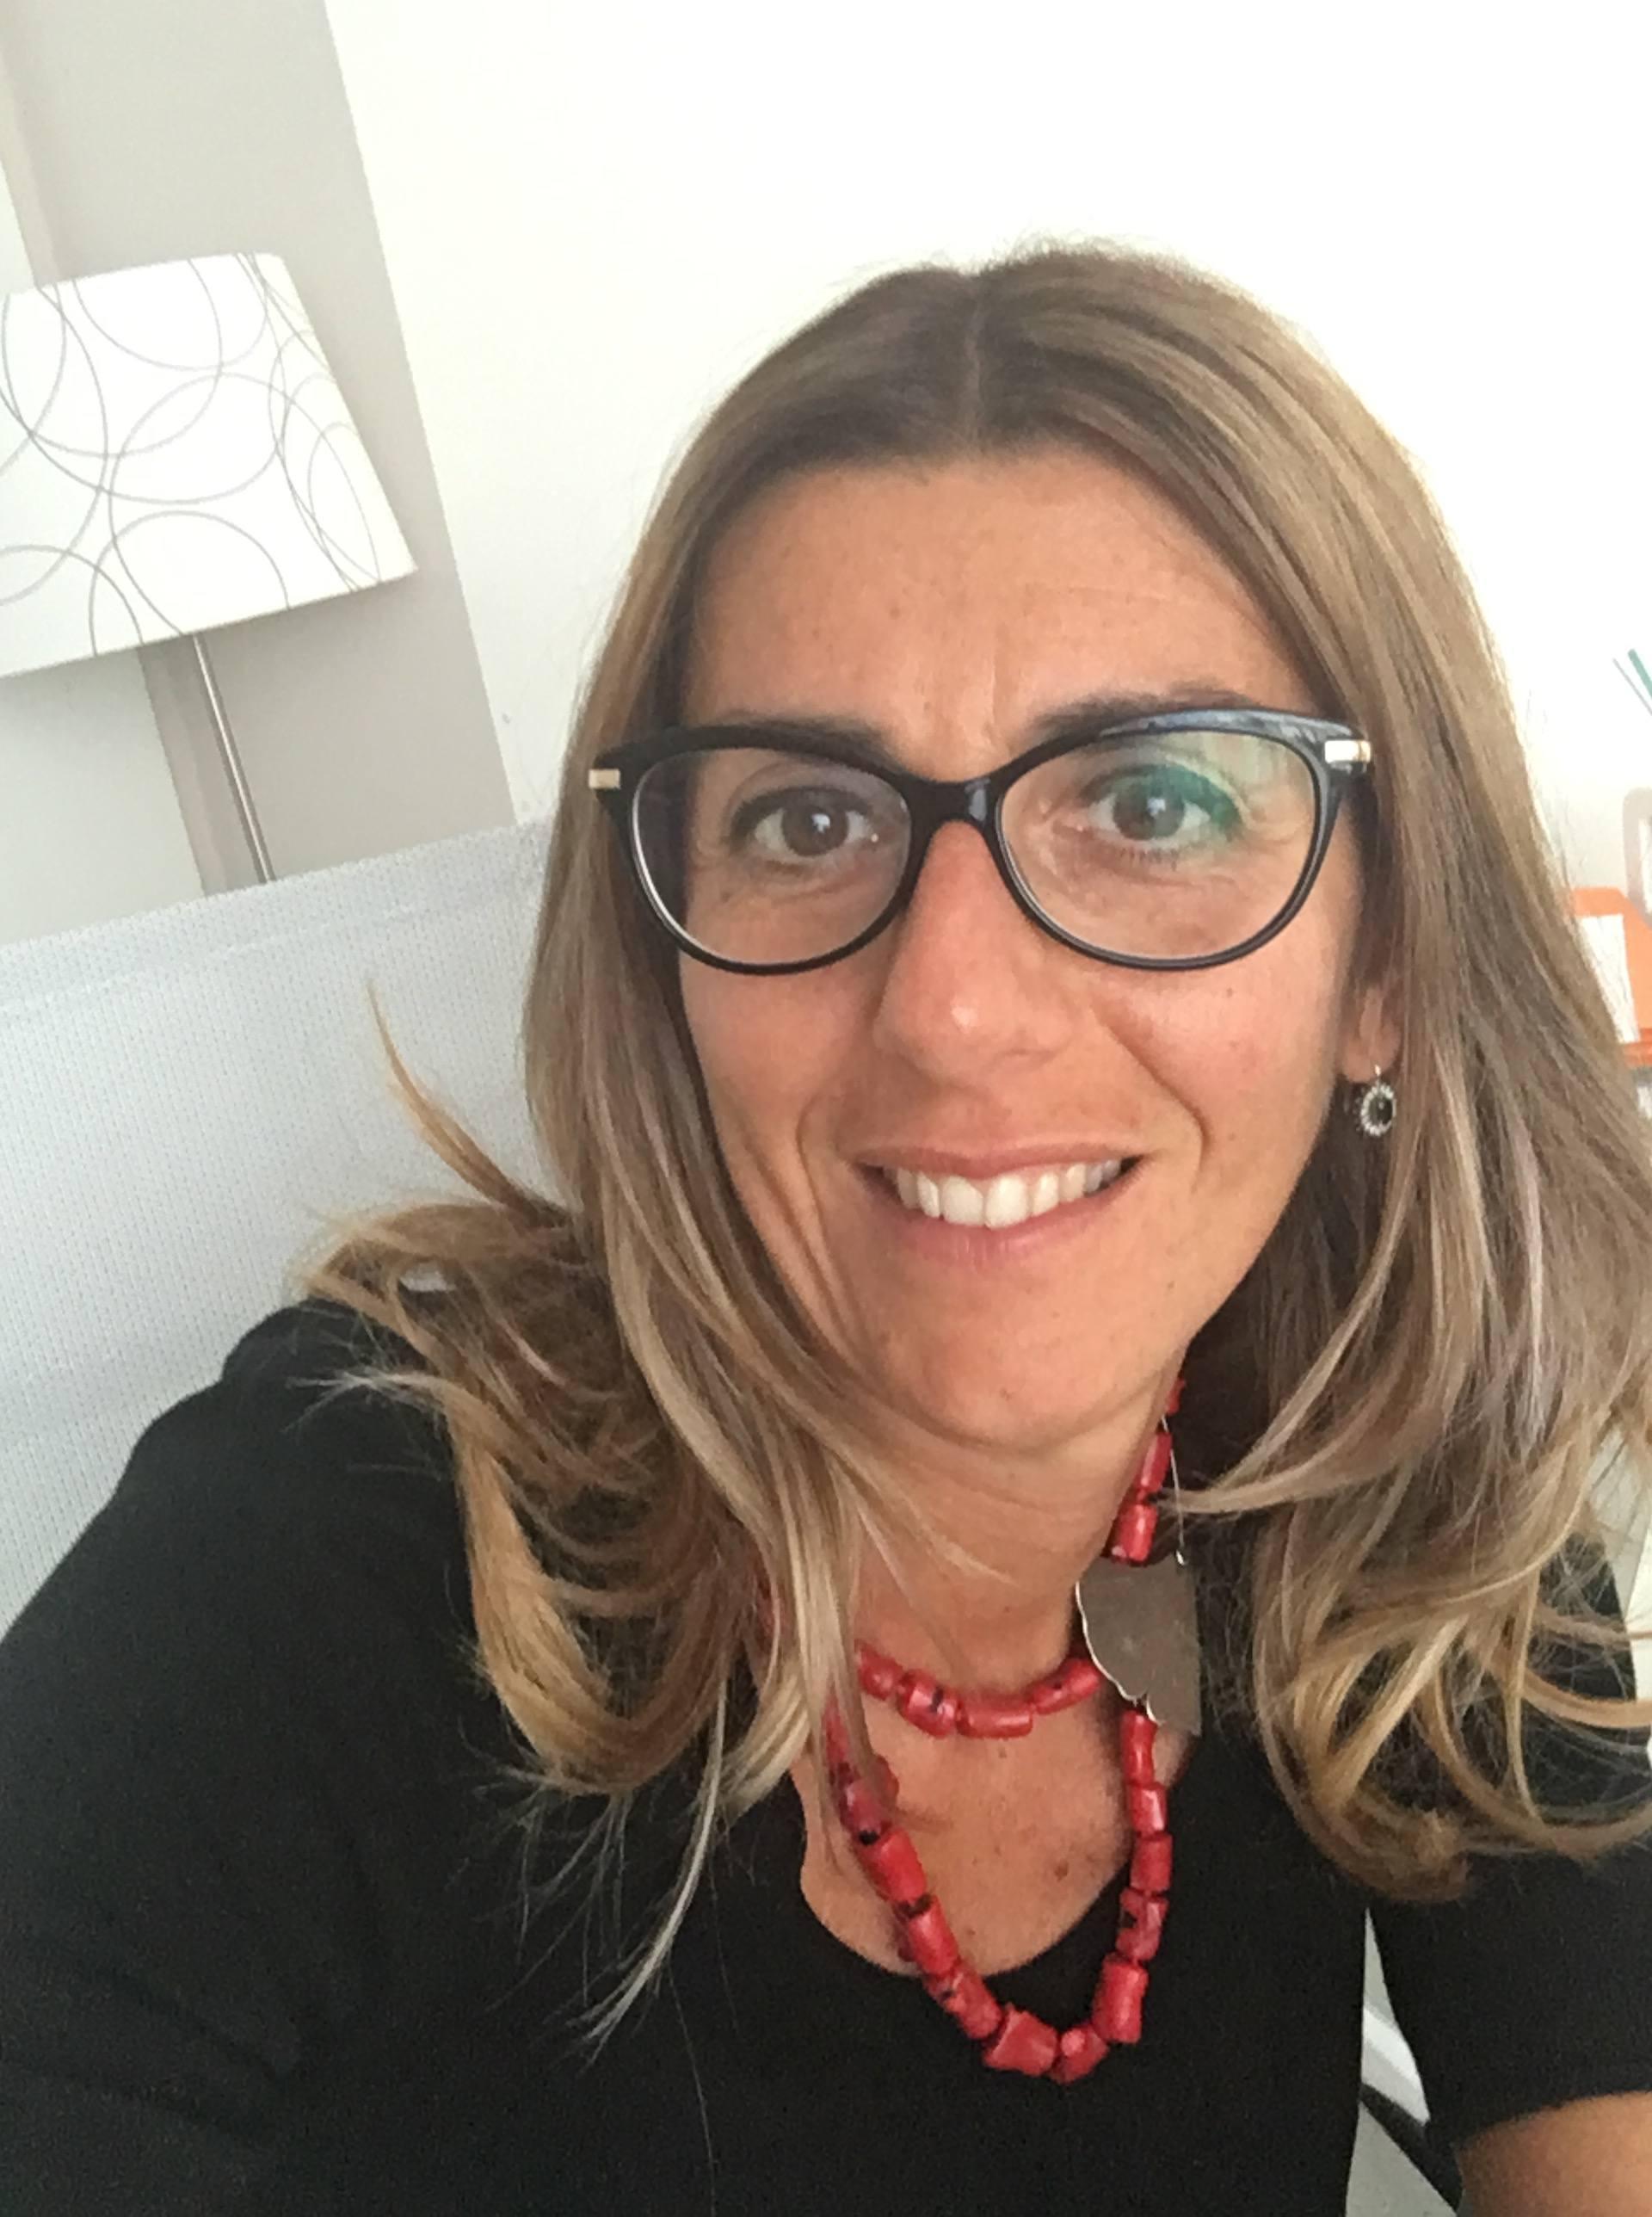 https://www.studicognitivi.it/wp-content/uploads/2016/10/Morena-Gianotti-Studi-Cognitivi.jpg - Studi Cognitivi